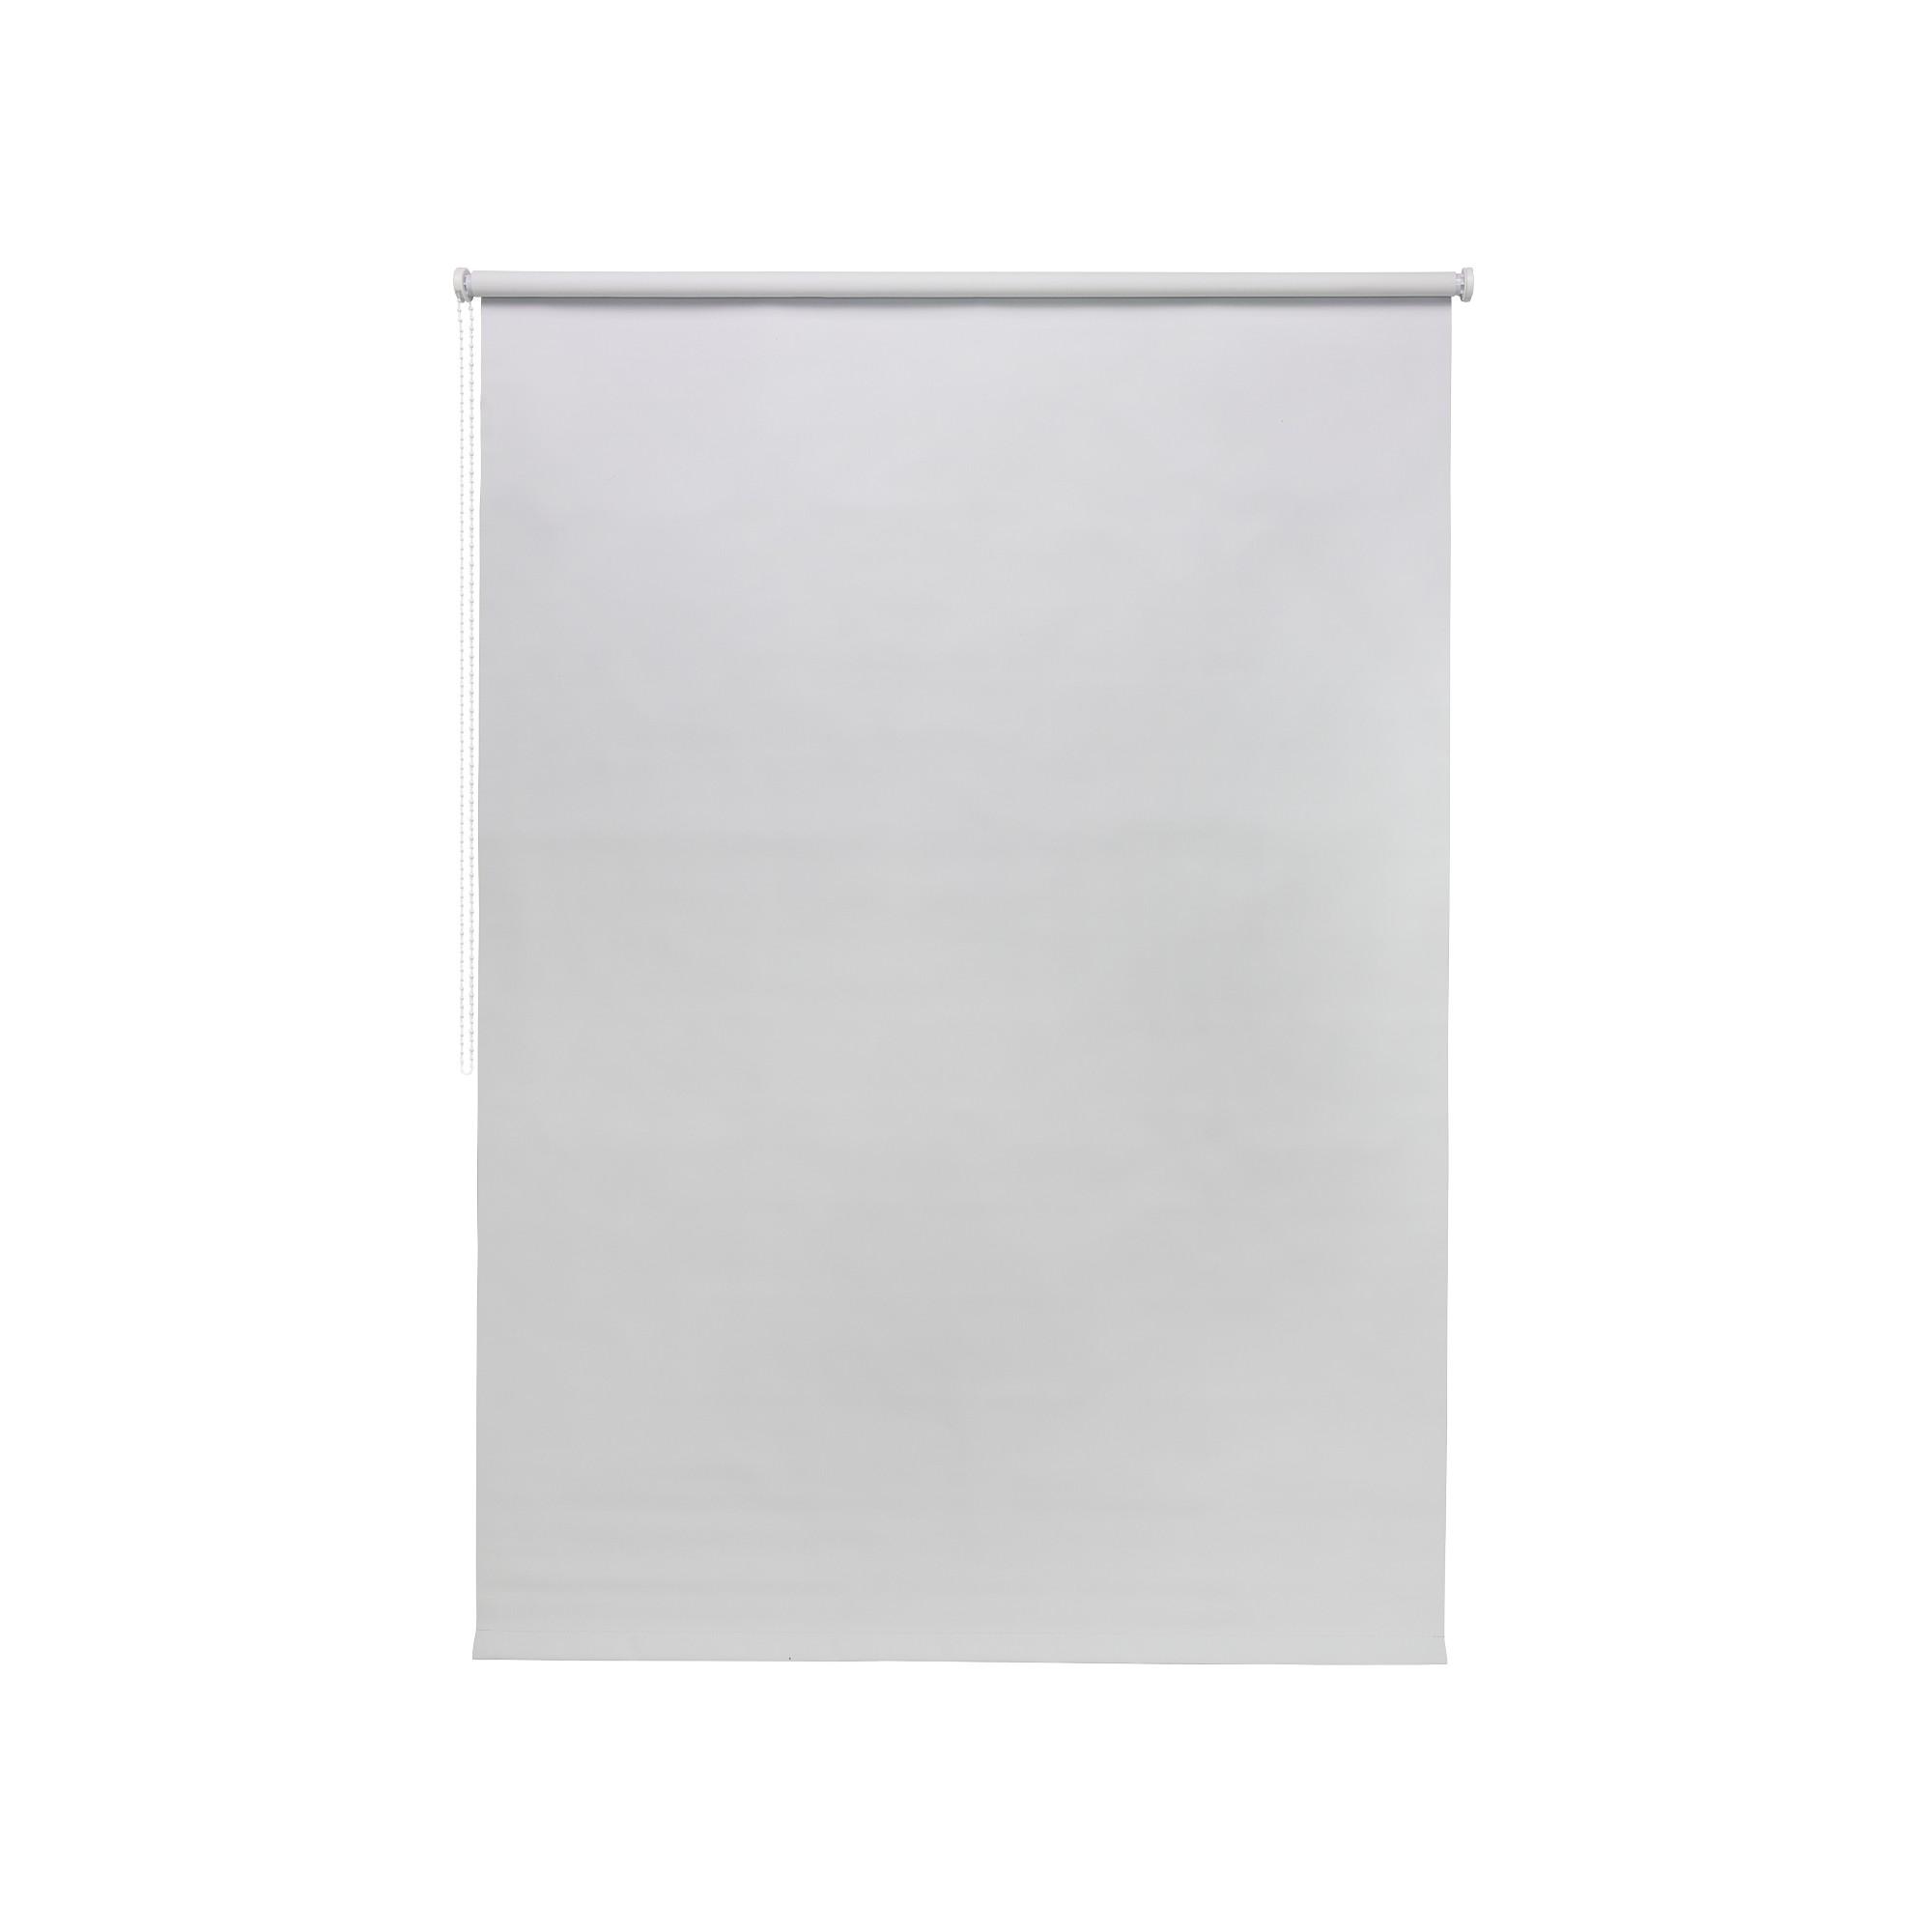 Persiana Rolo Poliester 80x170 cm Branco 7-3 - Jolie